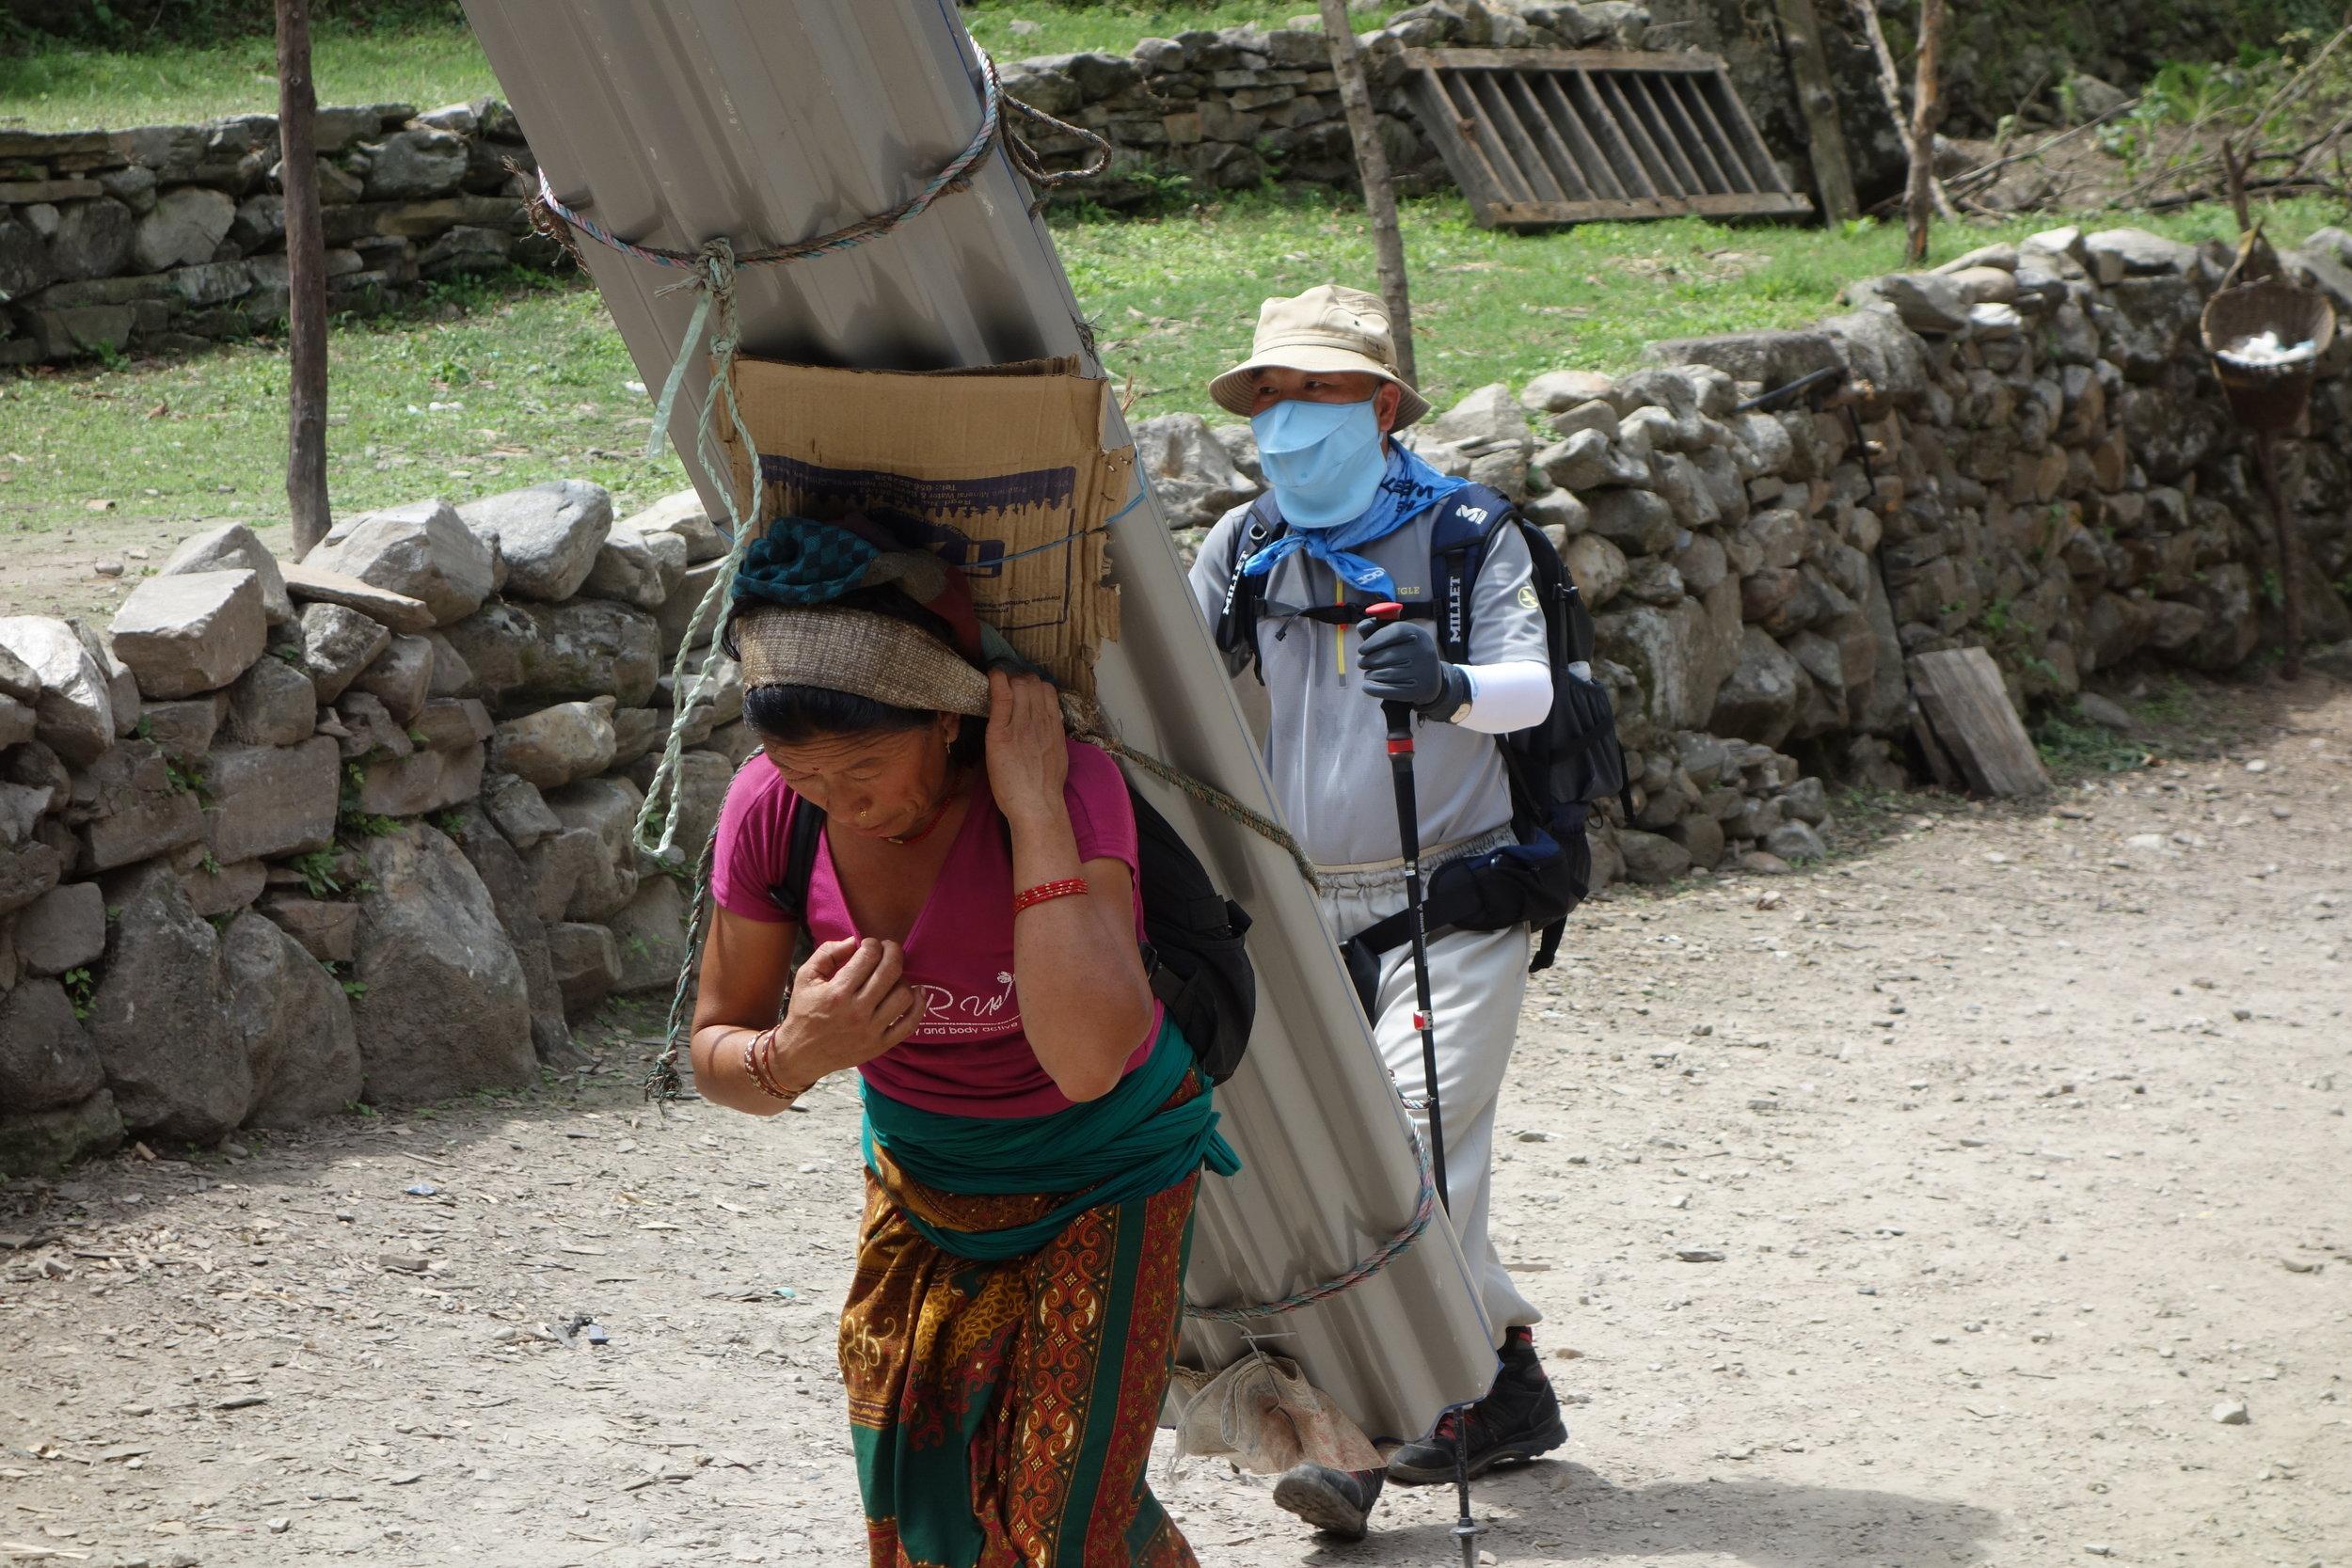 nev nepal 2015 photosd 171.JPG